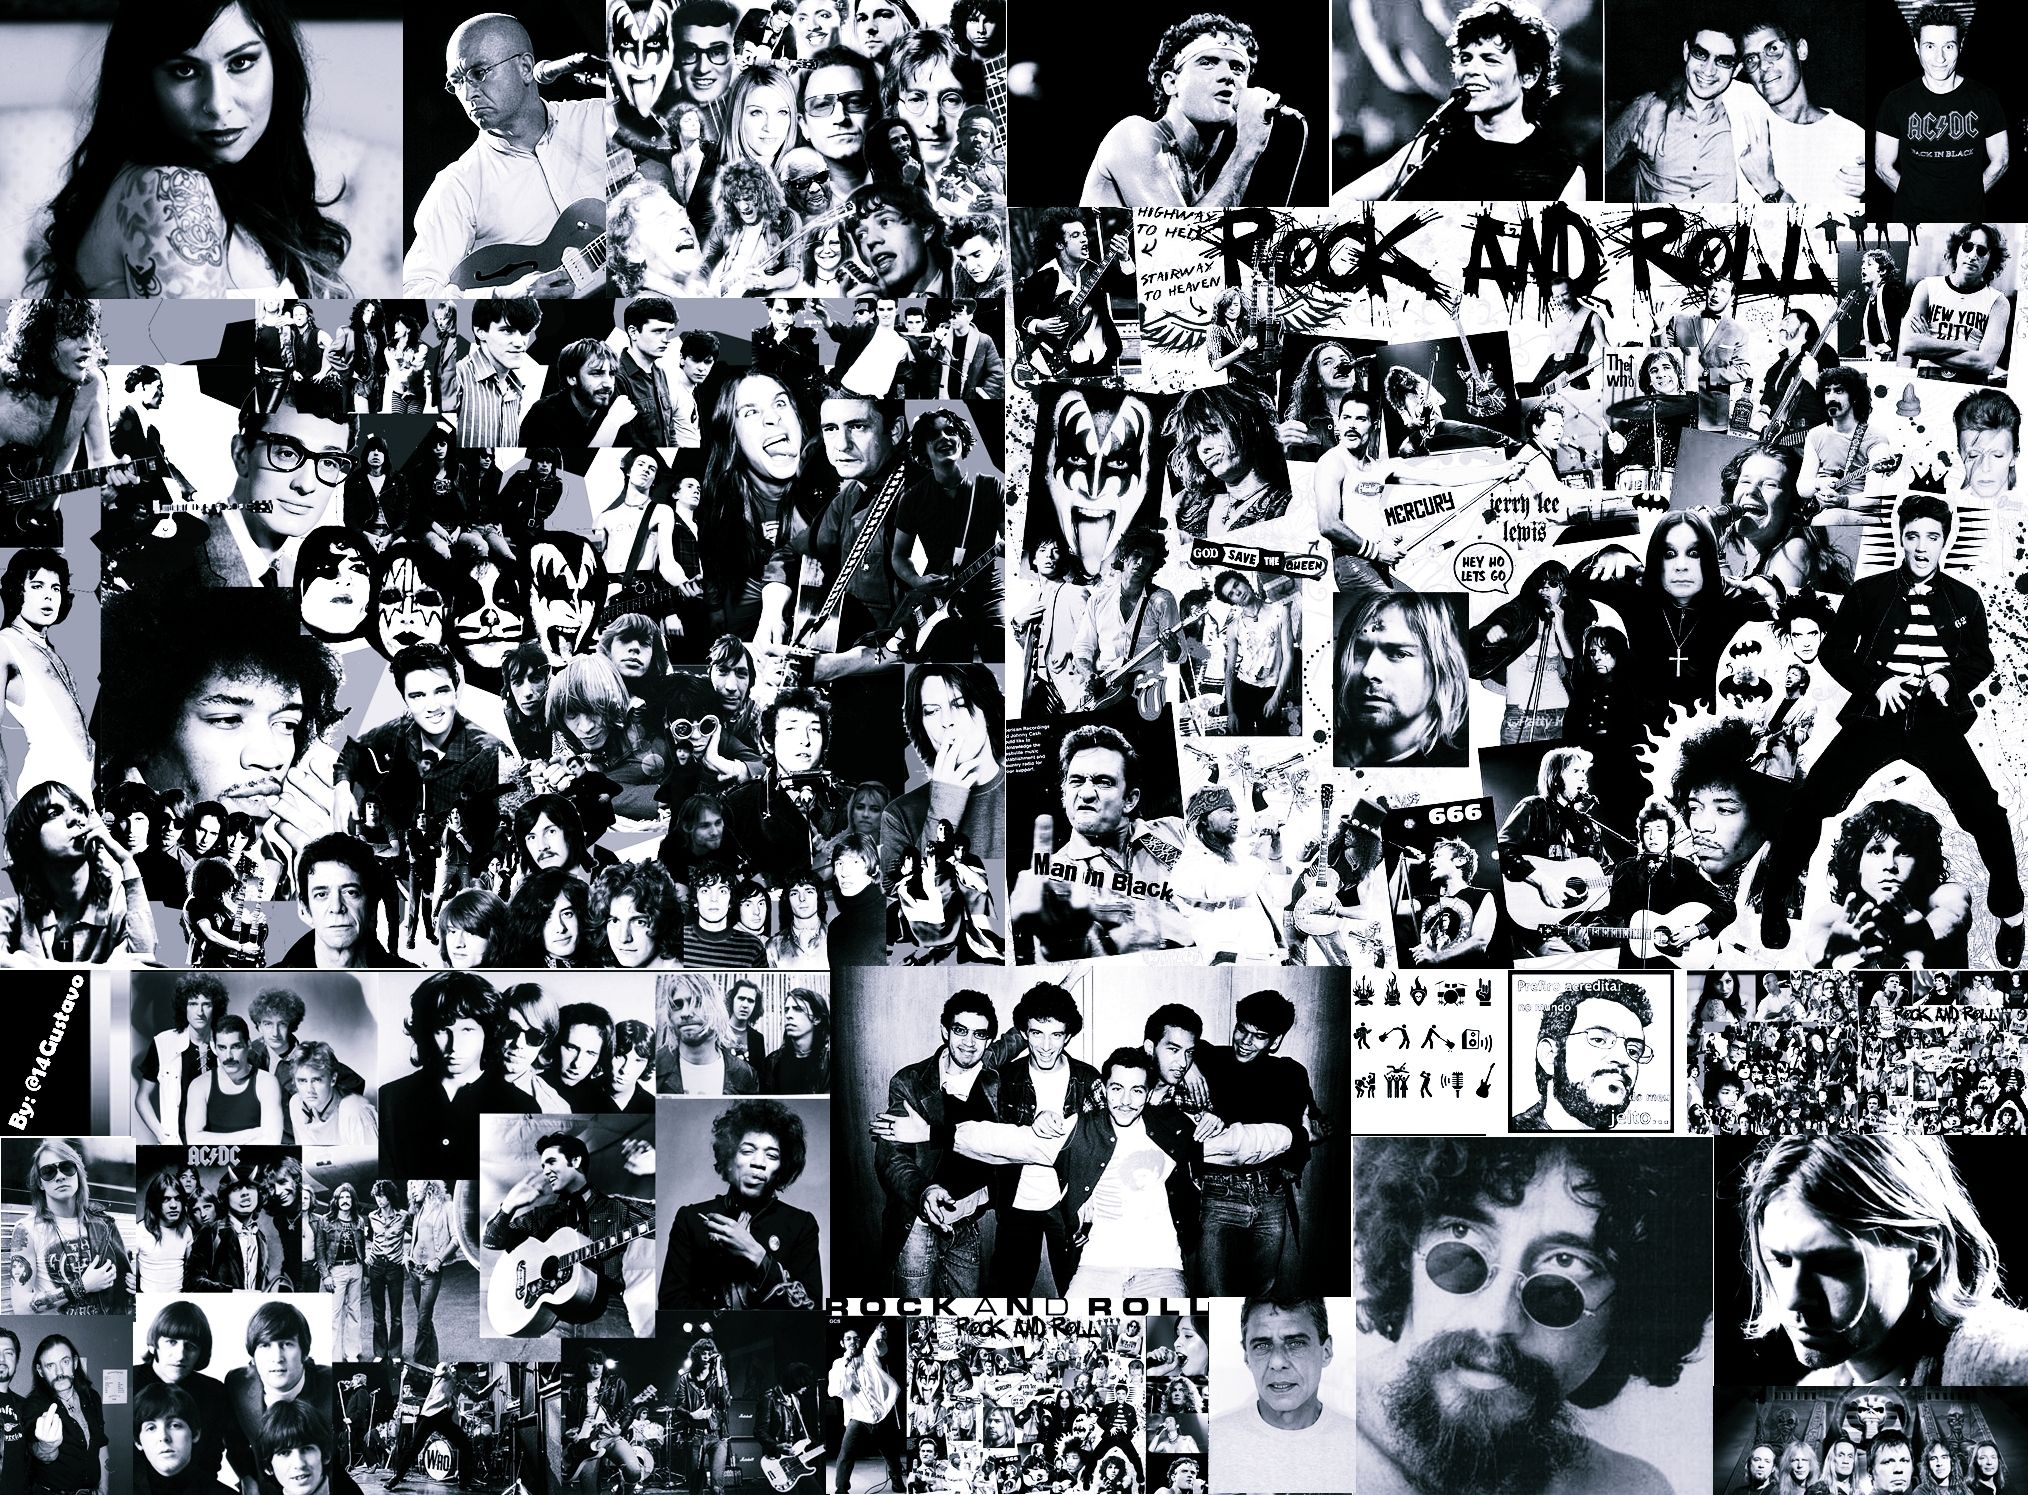 Rock And Roll Wallpaper Forwallpaper Com Rock N Roll